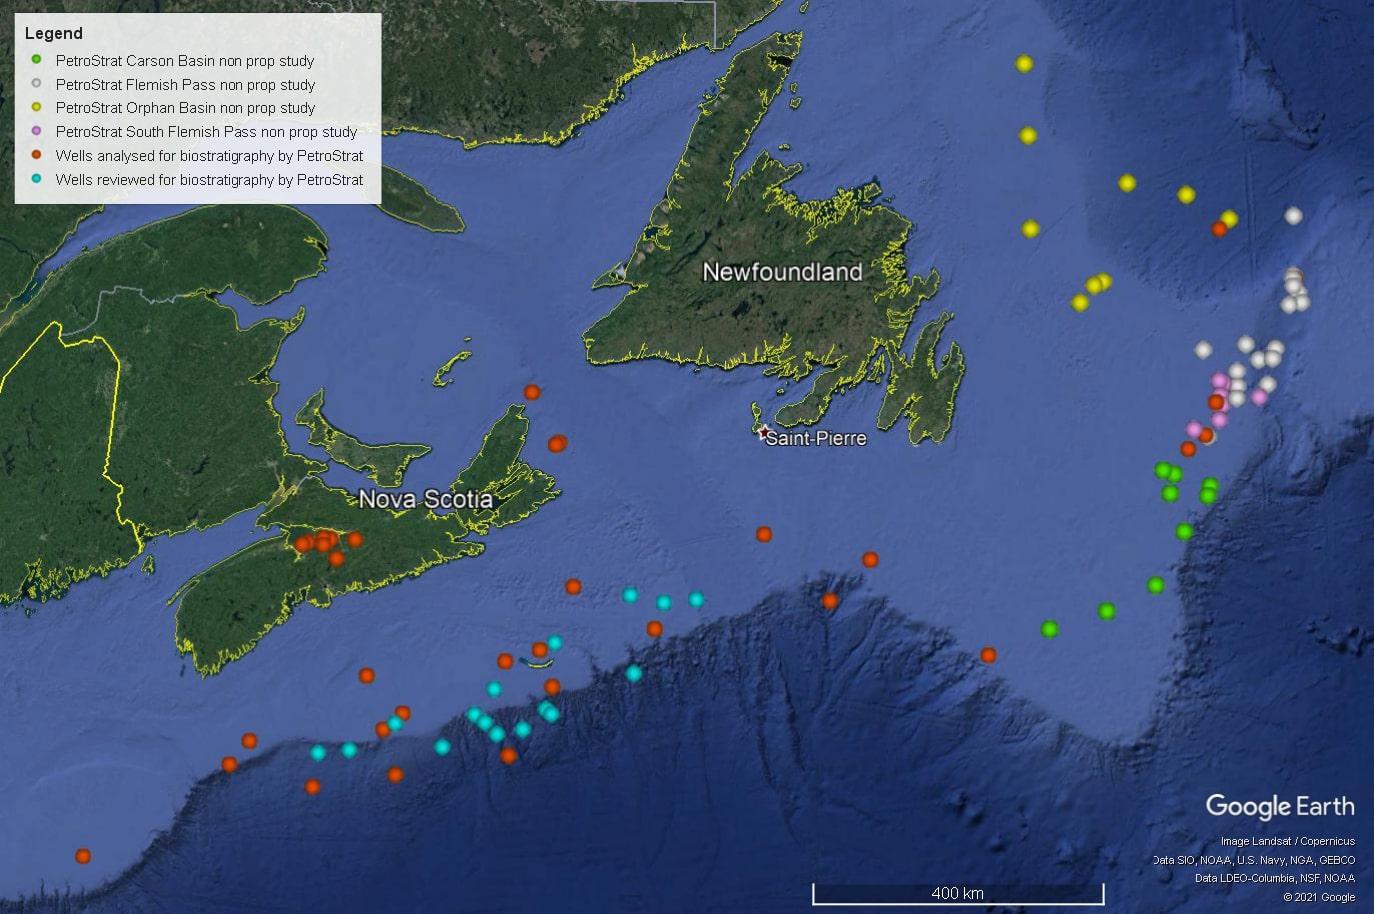 Petrostrat North America Global Biostratigraphy Experience Well Map Canada Newfoundland Nova Scotia Atlantic Margins